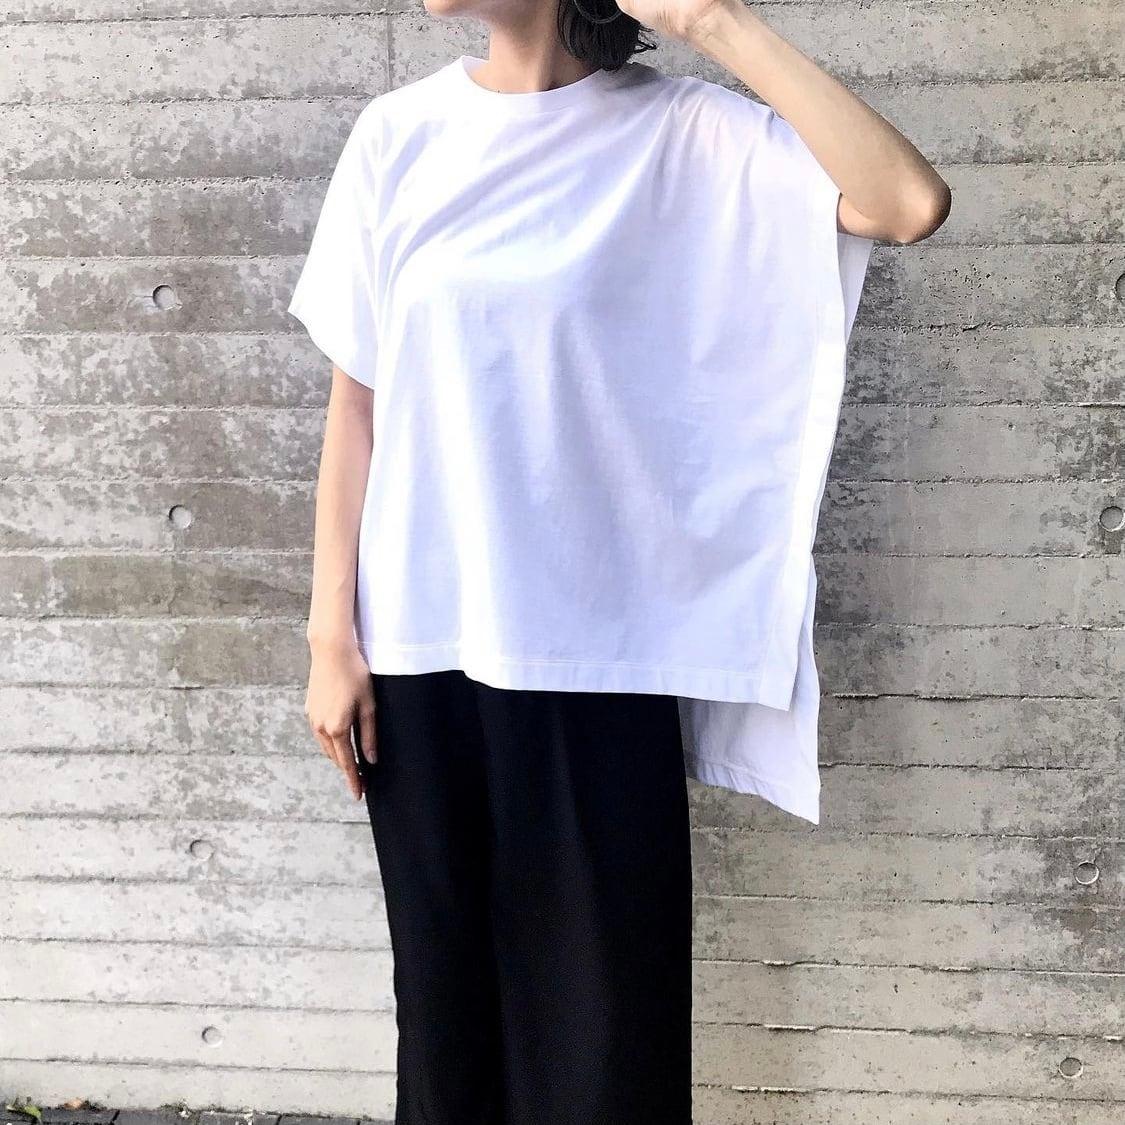 【 siro de labonte 】- R113229 - ポンチョTシャツ